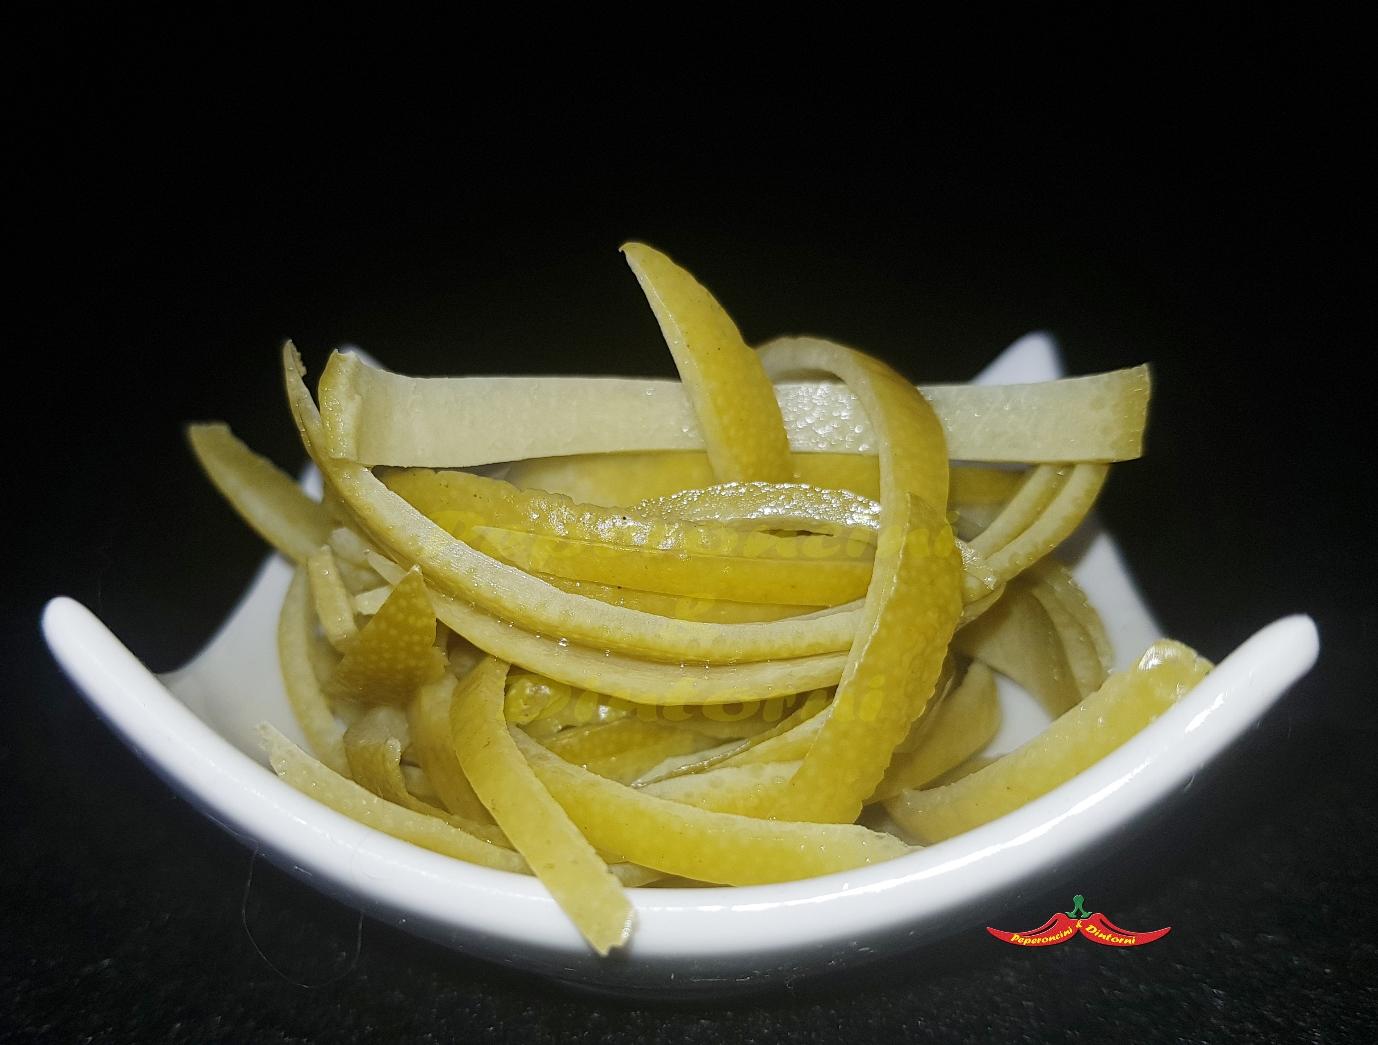 Fiammiferi di Zeste di Limoni Verdelli